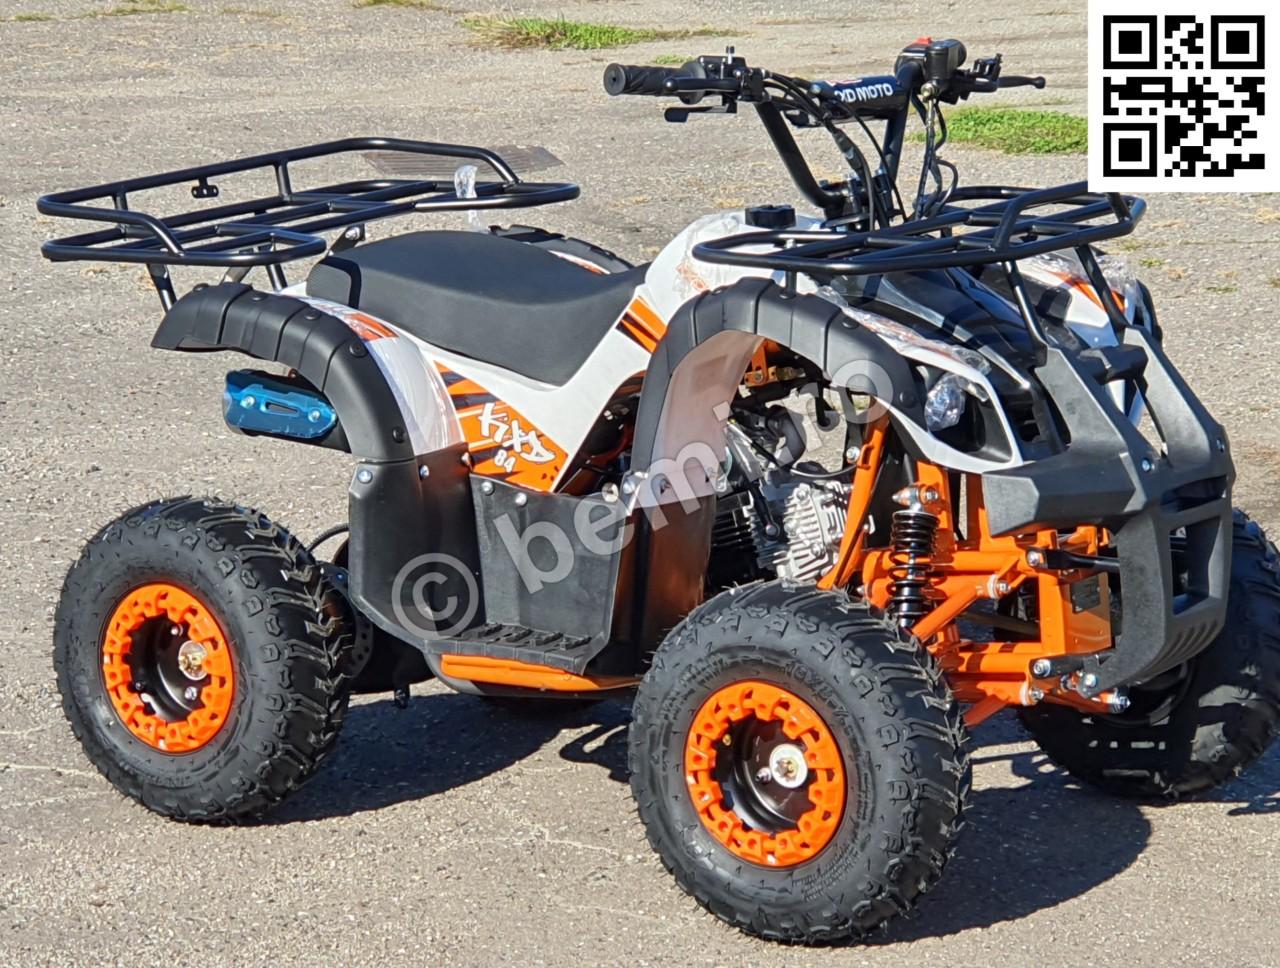 ATV BEMI Germany 0Km Grizzly 125cc automatic